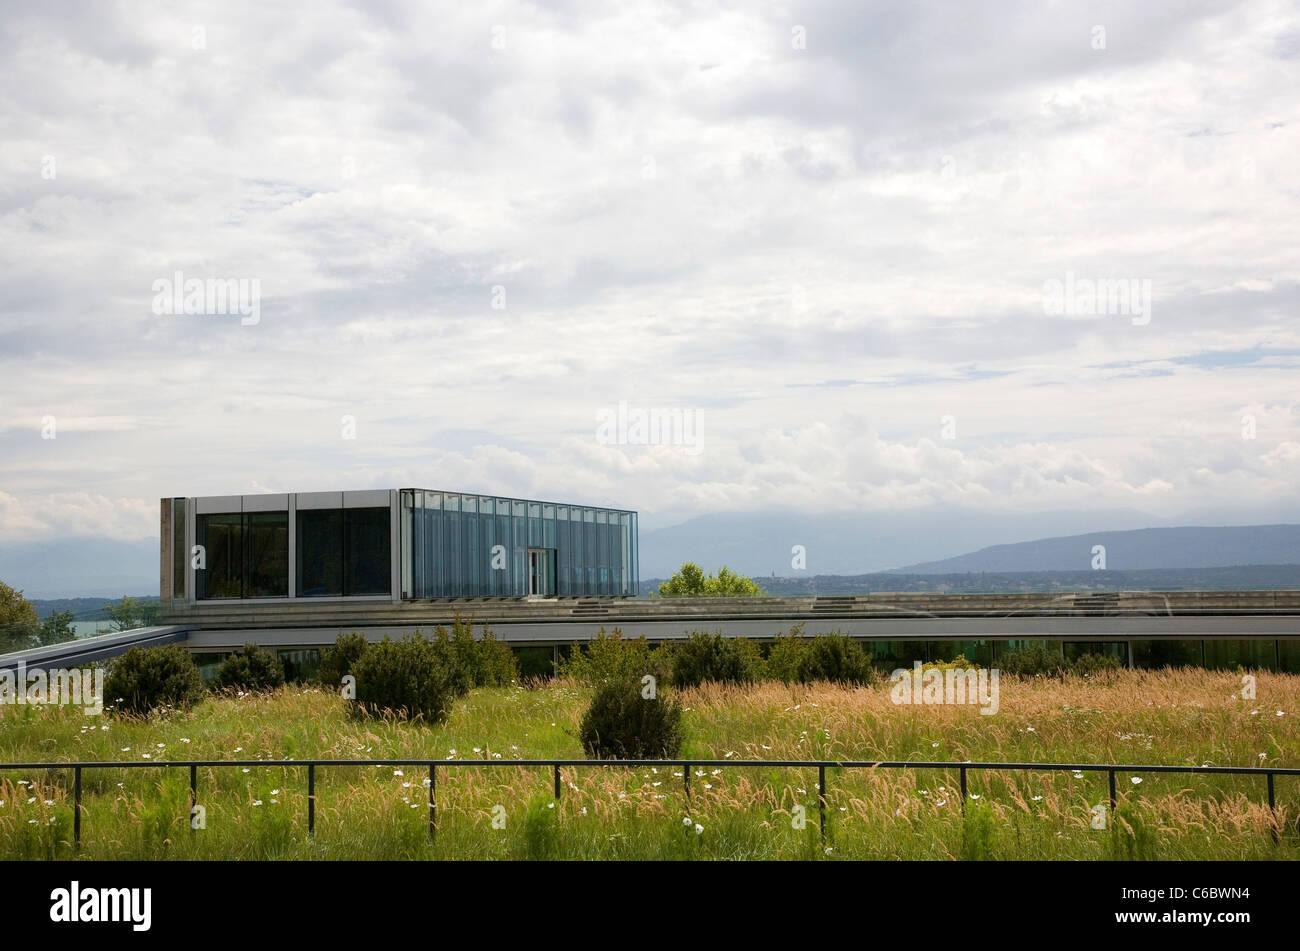 UEFA ( Union of European Football Associations ) headquarters in Nyon - Stock Image